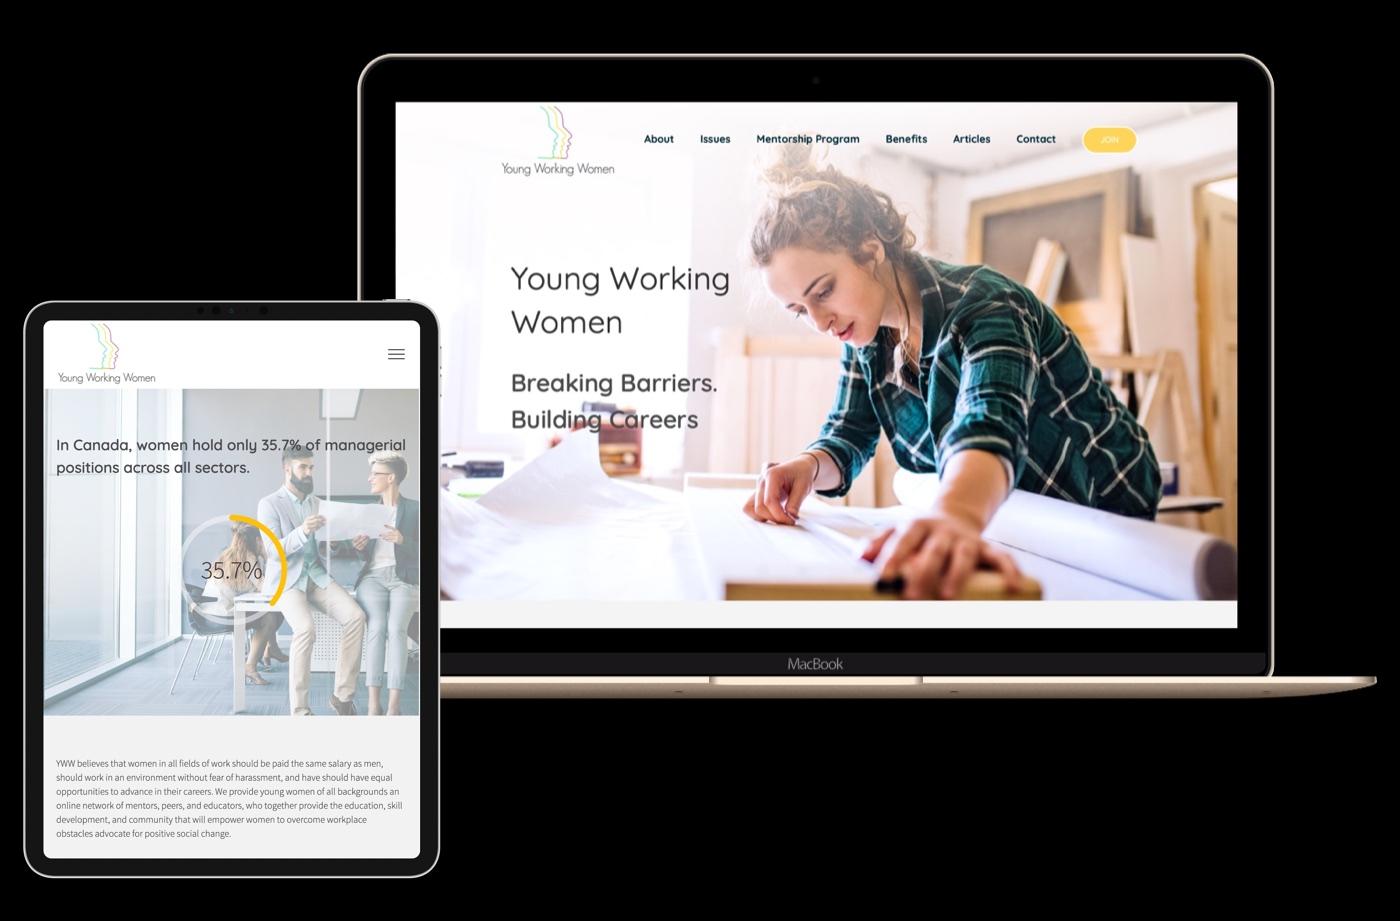 Young working women portfolio image